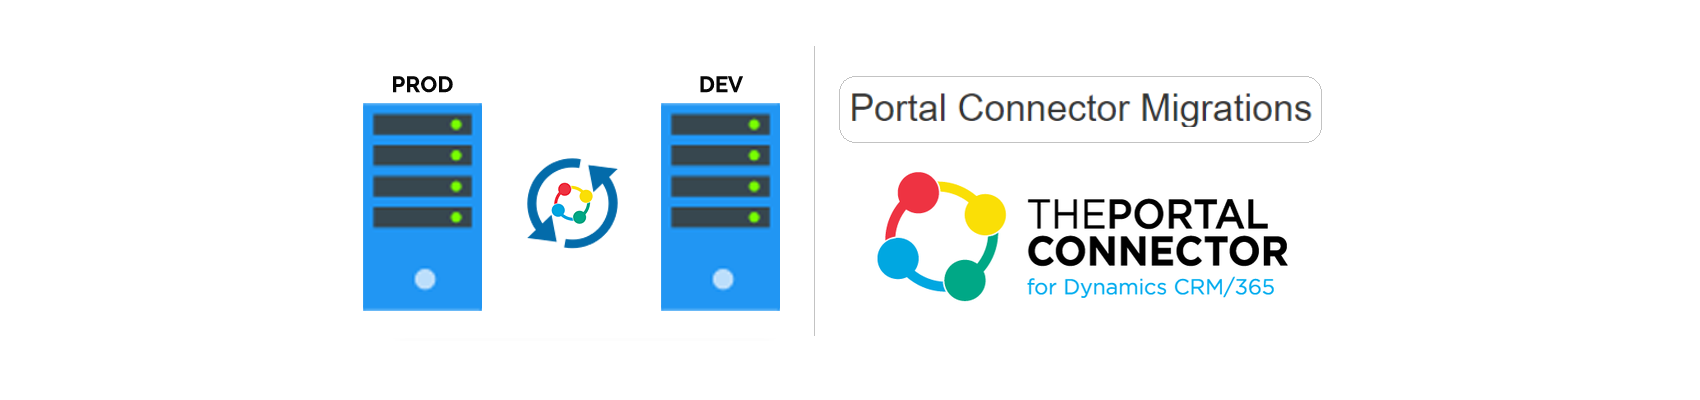 The Portal Connector Migration Module